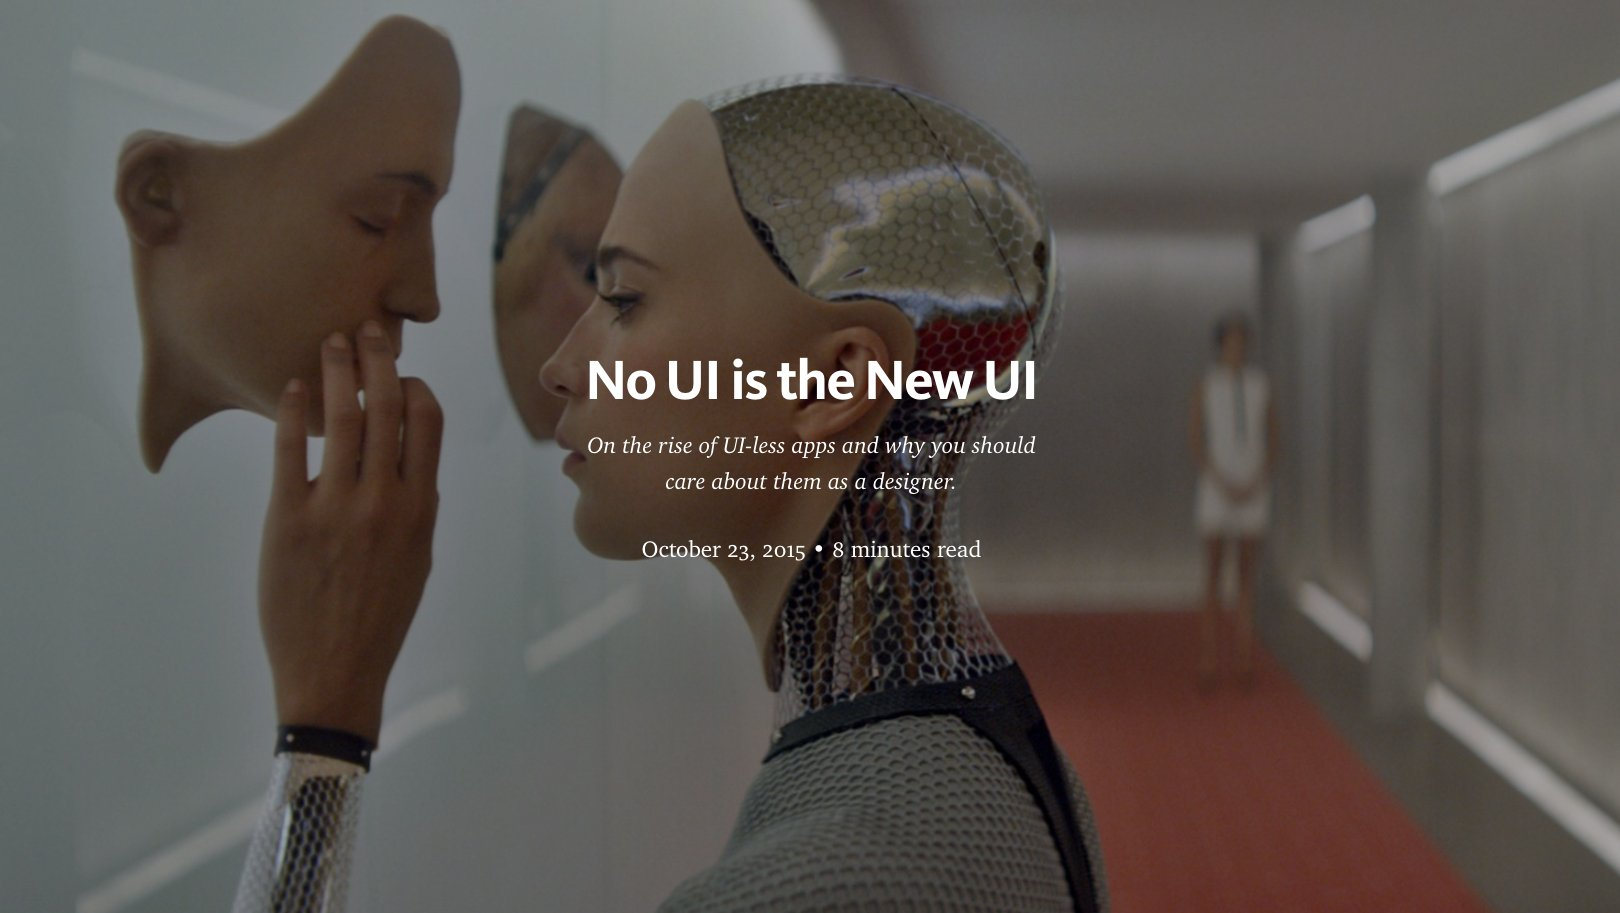 "RT @wdtrends: ""No UI is the New UI"" by @aubetony https://t.co/aej2dOaFGd https://t.co/WWHmZD1lQk"